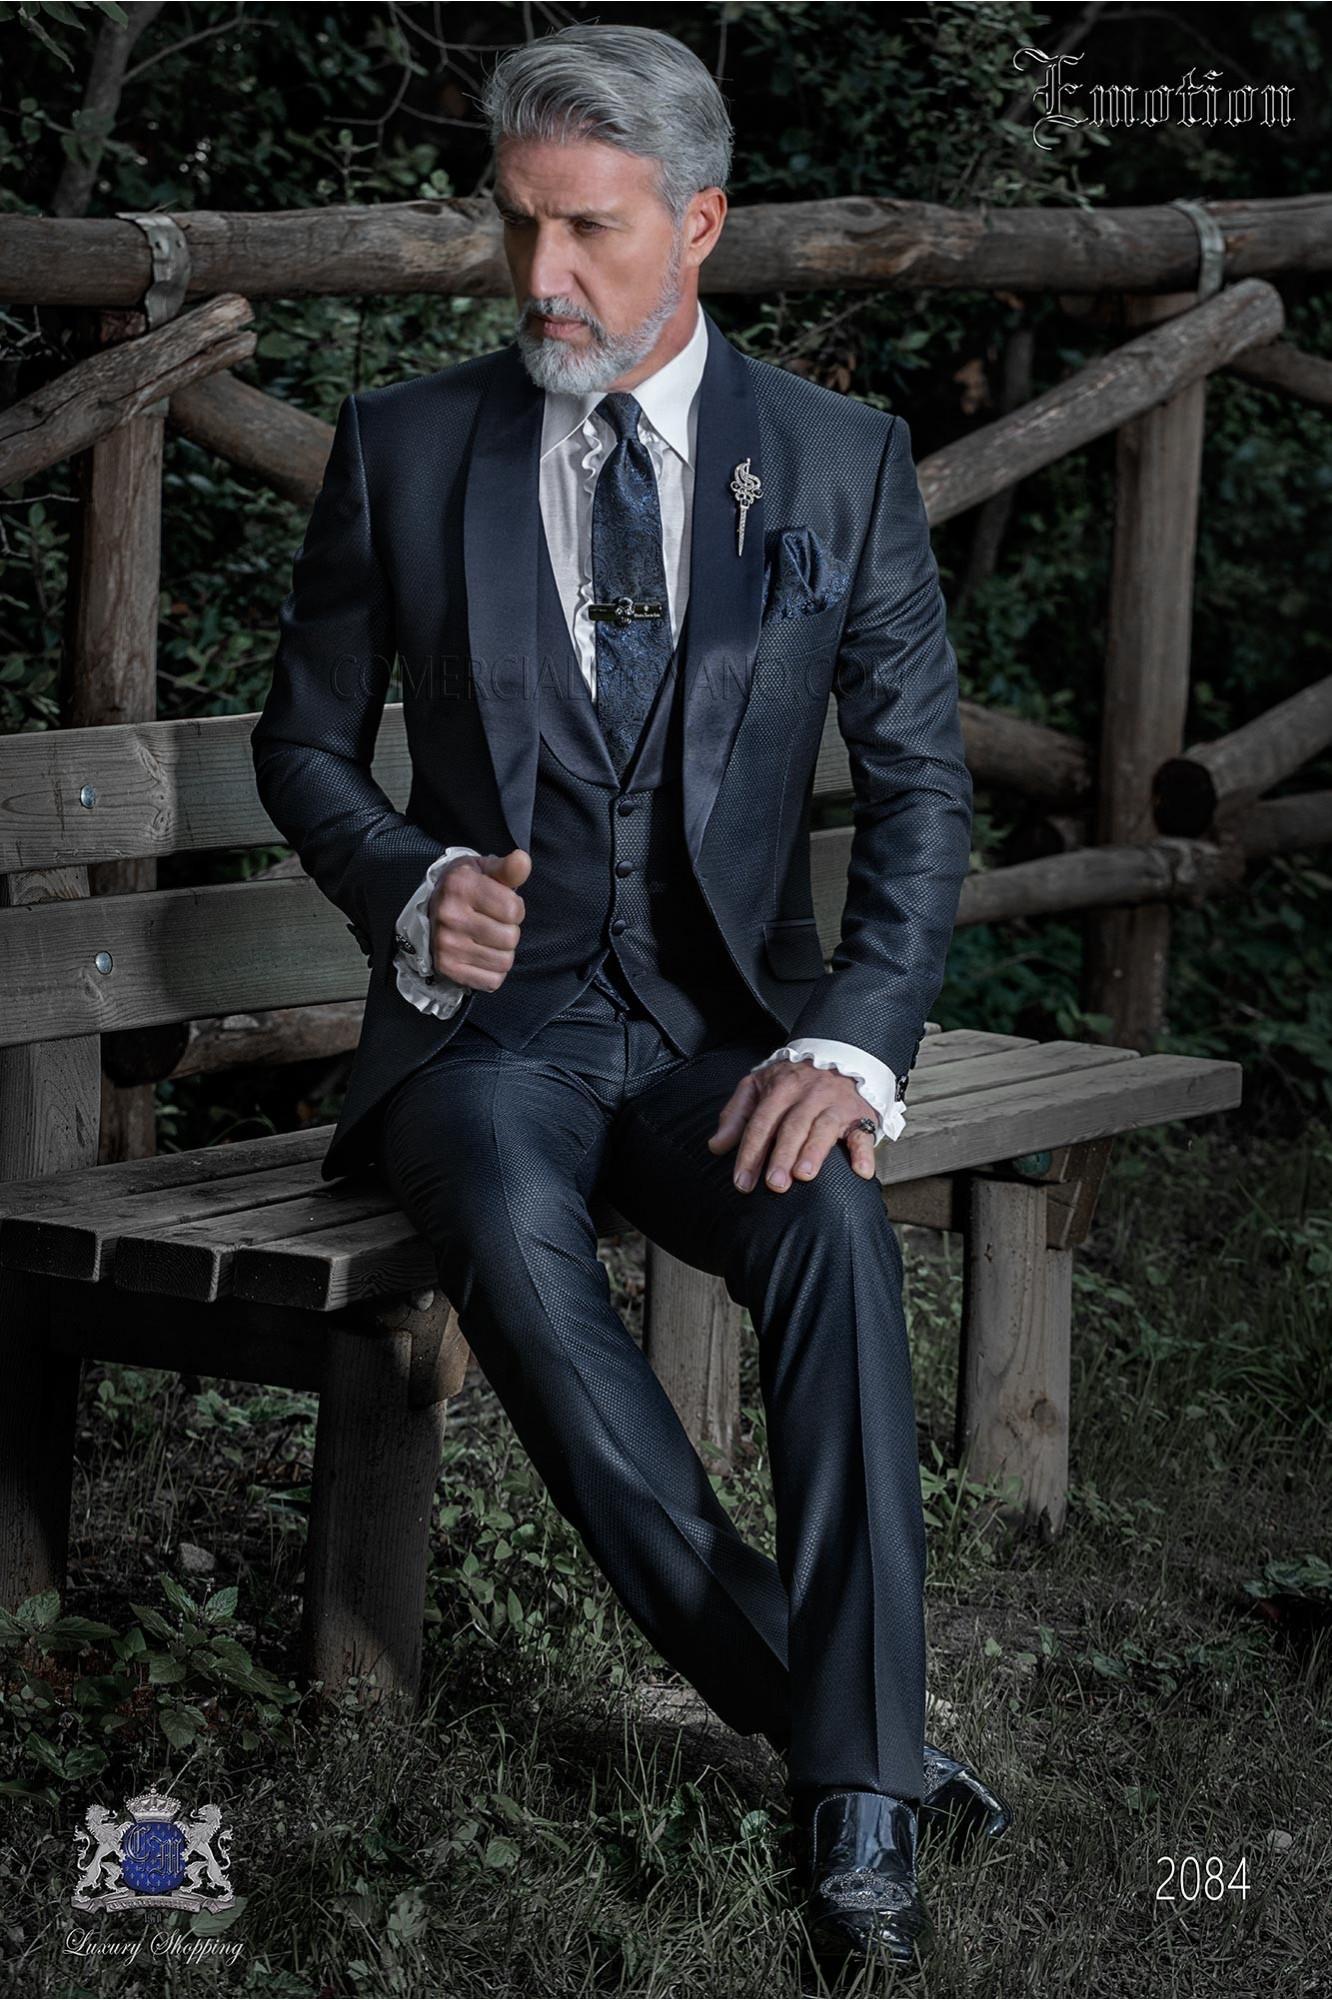 Italian bespoke blue tuxedo with satin shawl collar